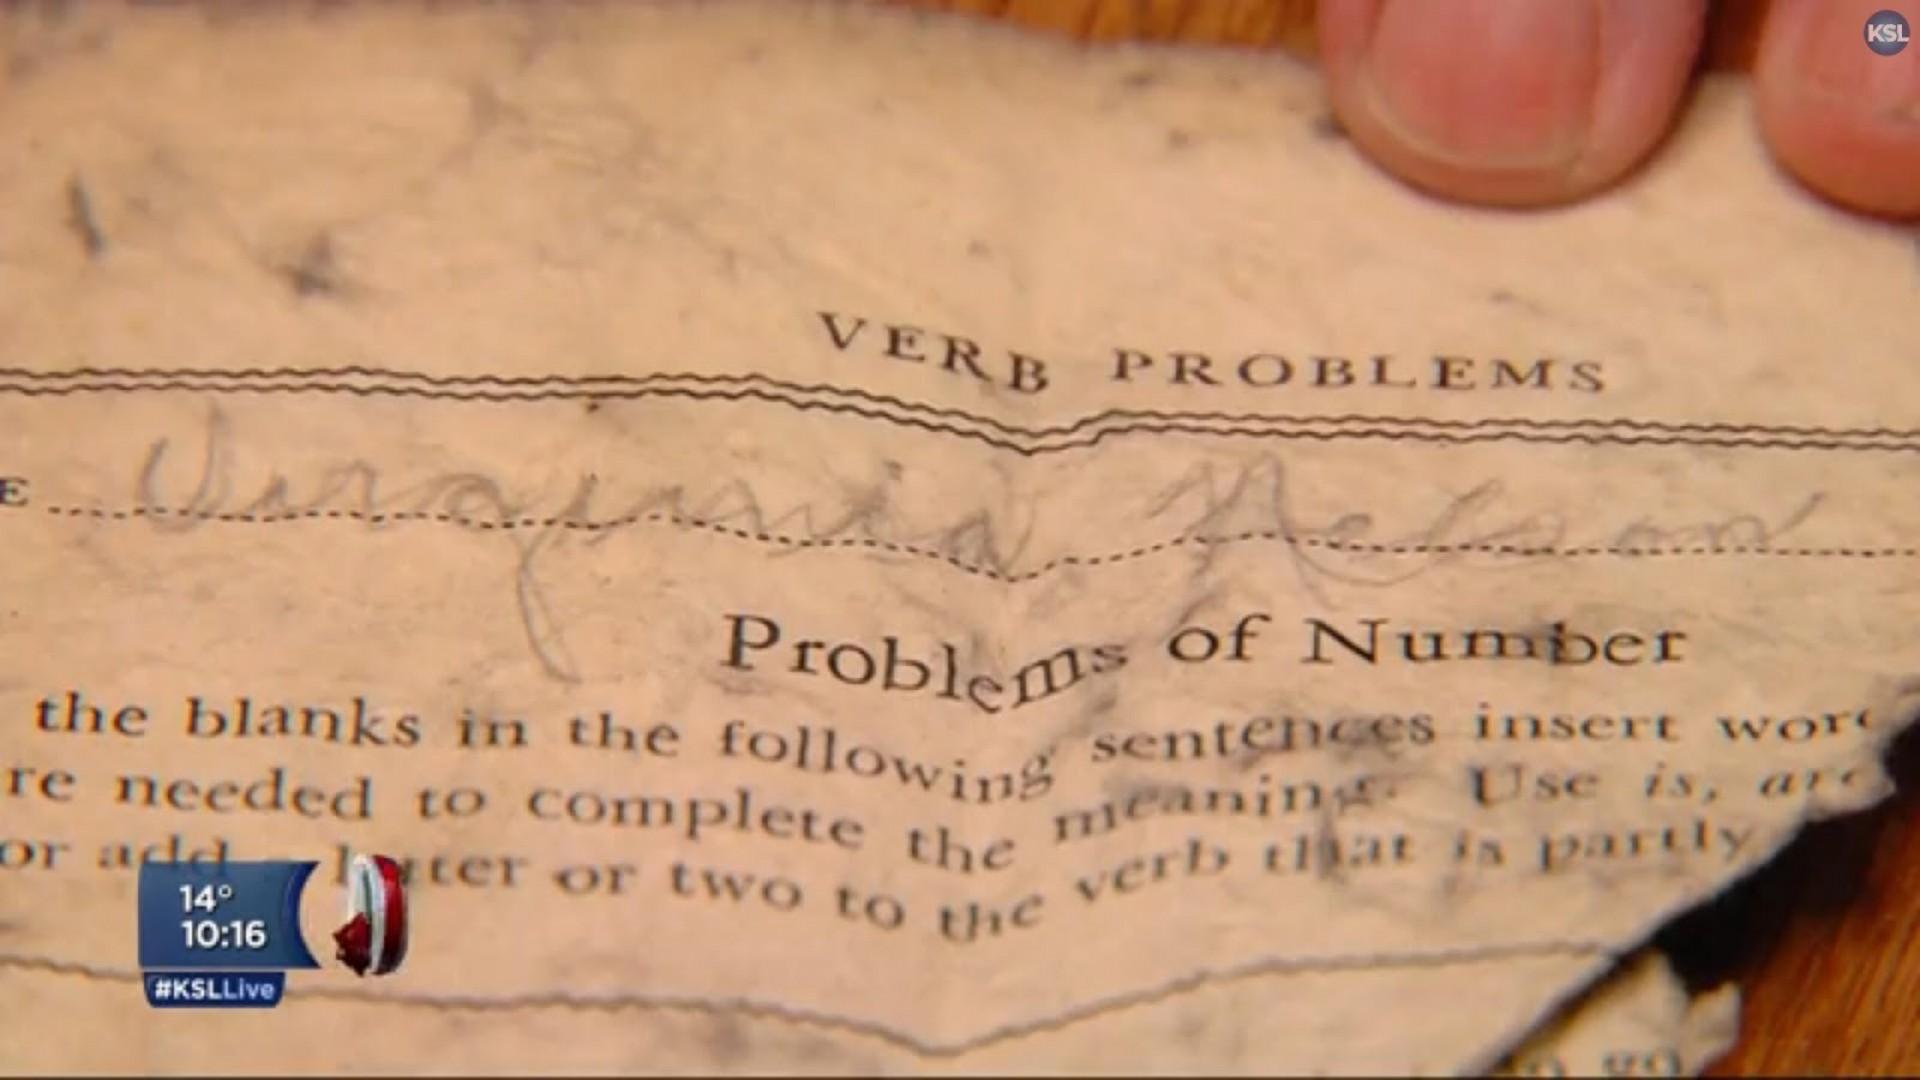 026 Tv Addiction Essay For Bsc Virginia2bnelson2bhomework Beautiful 1920